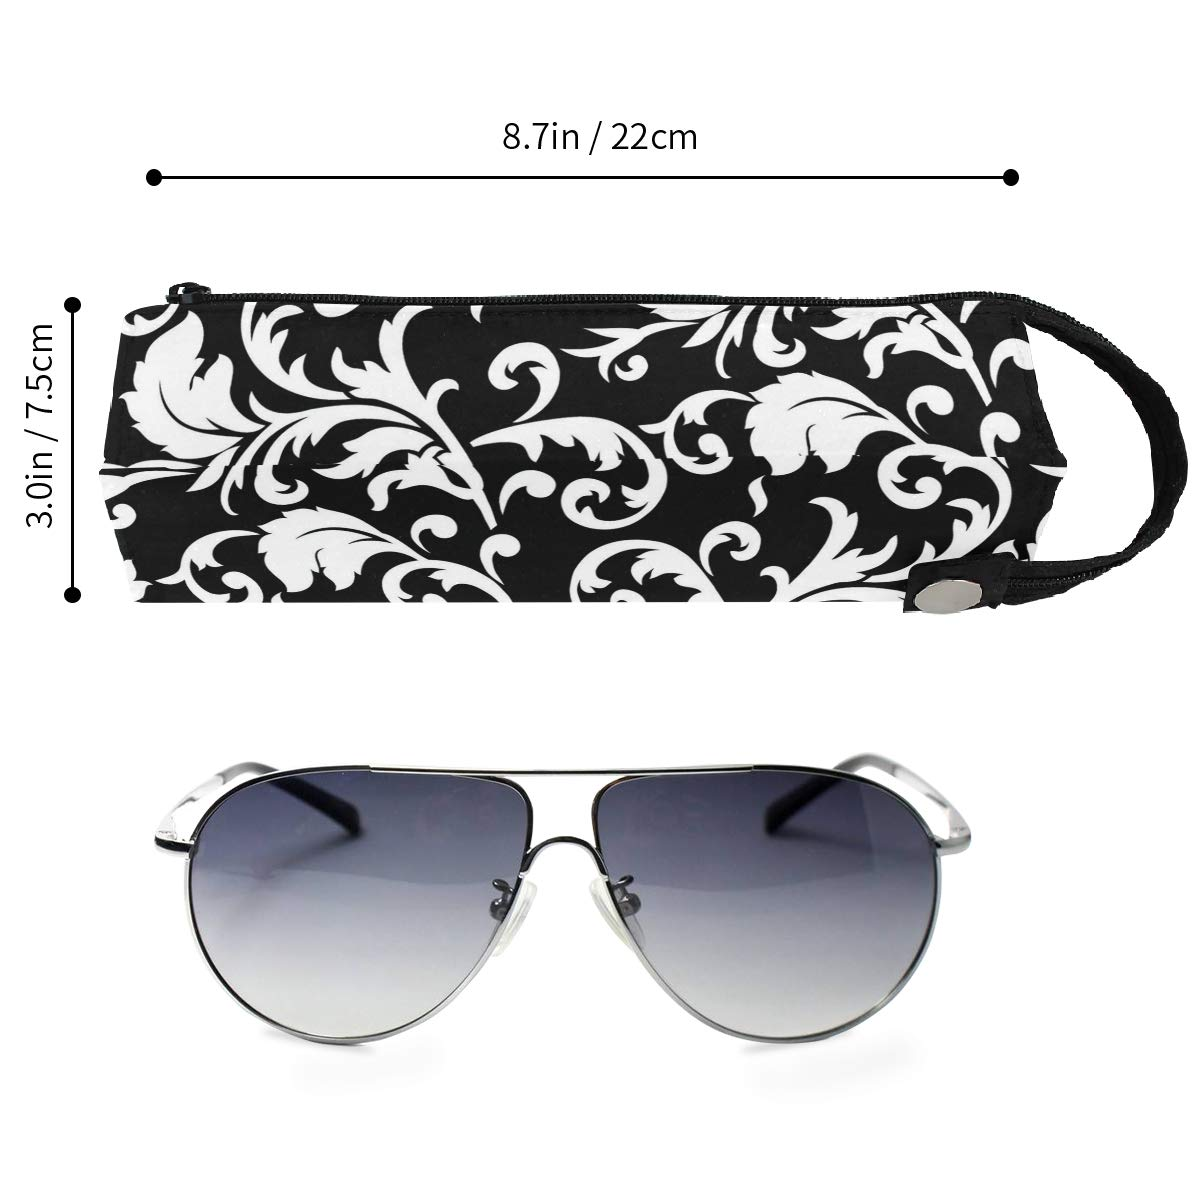 Glasses Case Purple Flower Clipart Butterfly Travel Soft Sunglasses Pen Bag Protective Holder